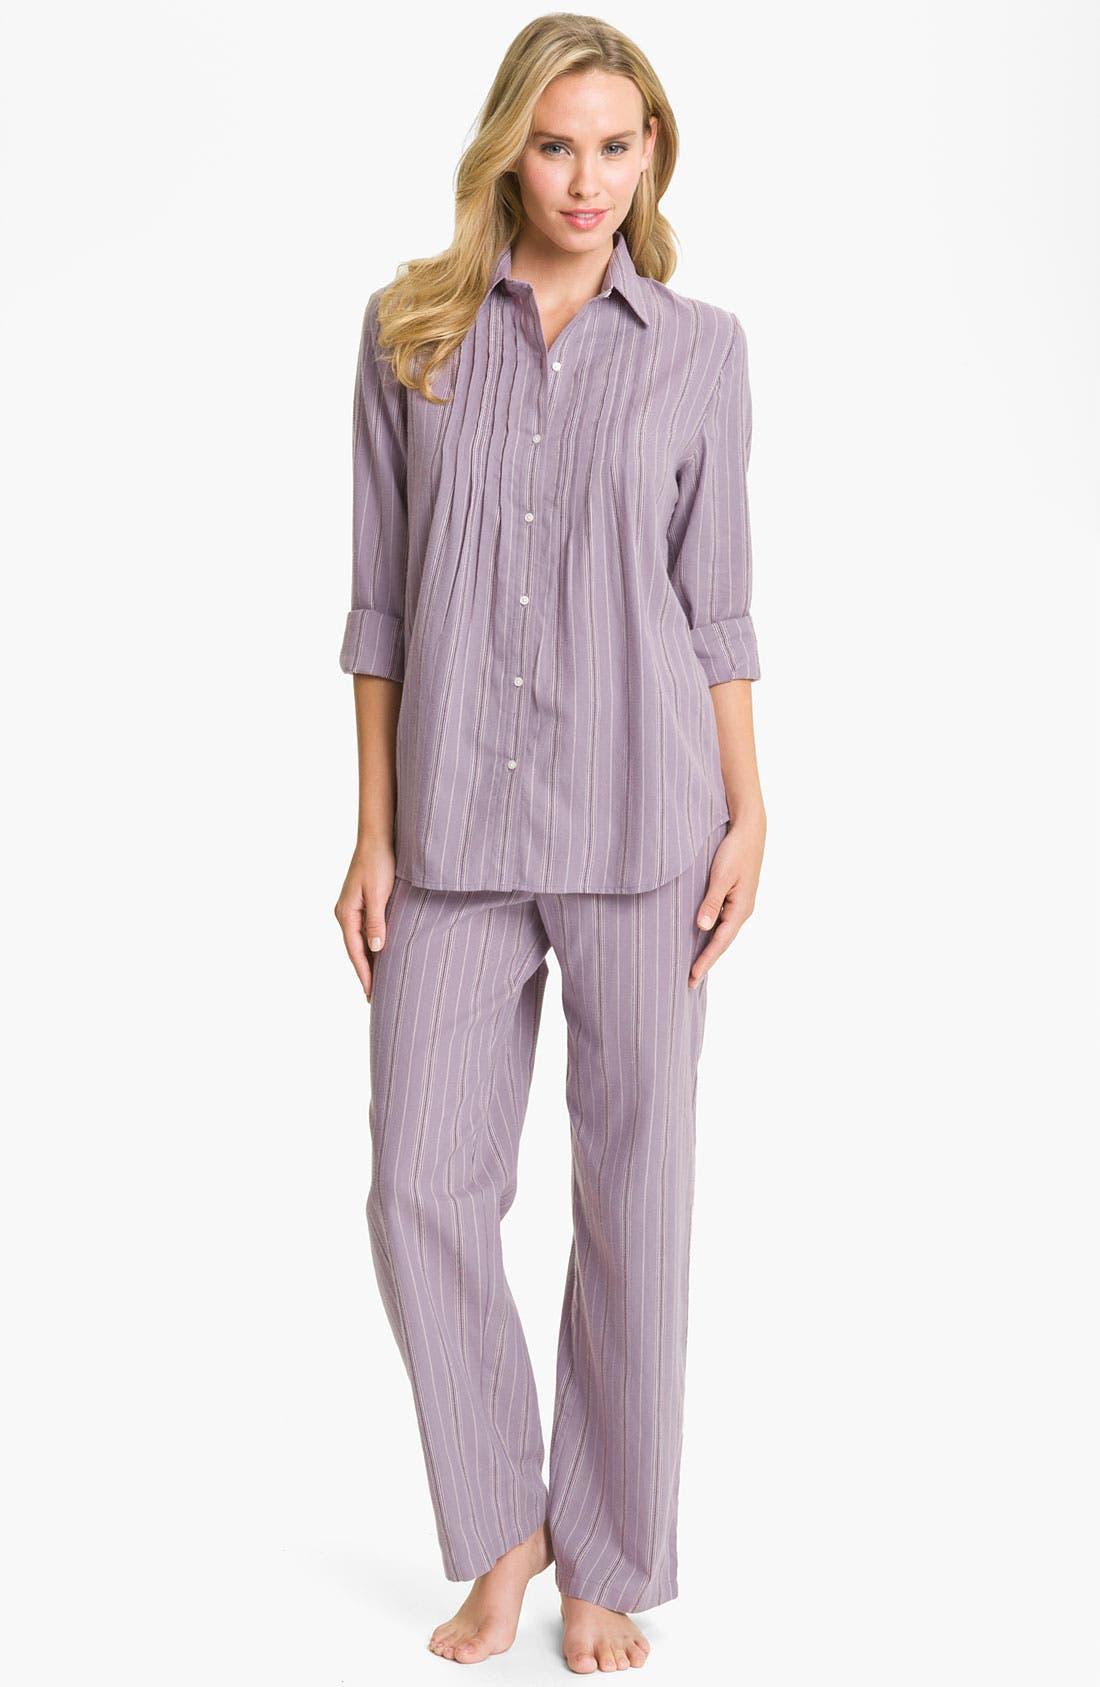 Alternate Image 1 Selected - Lauren Ralph Lauren Sleepwear Brushed Twill Pajamas